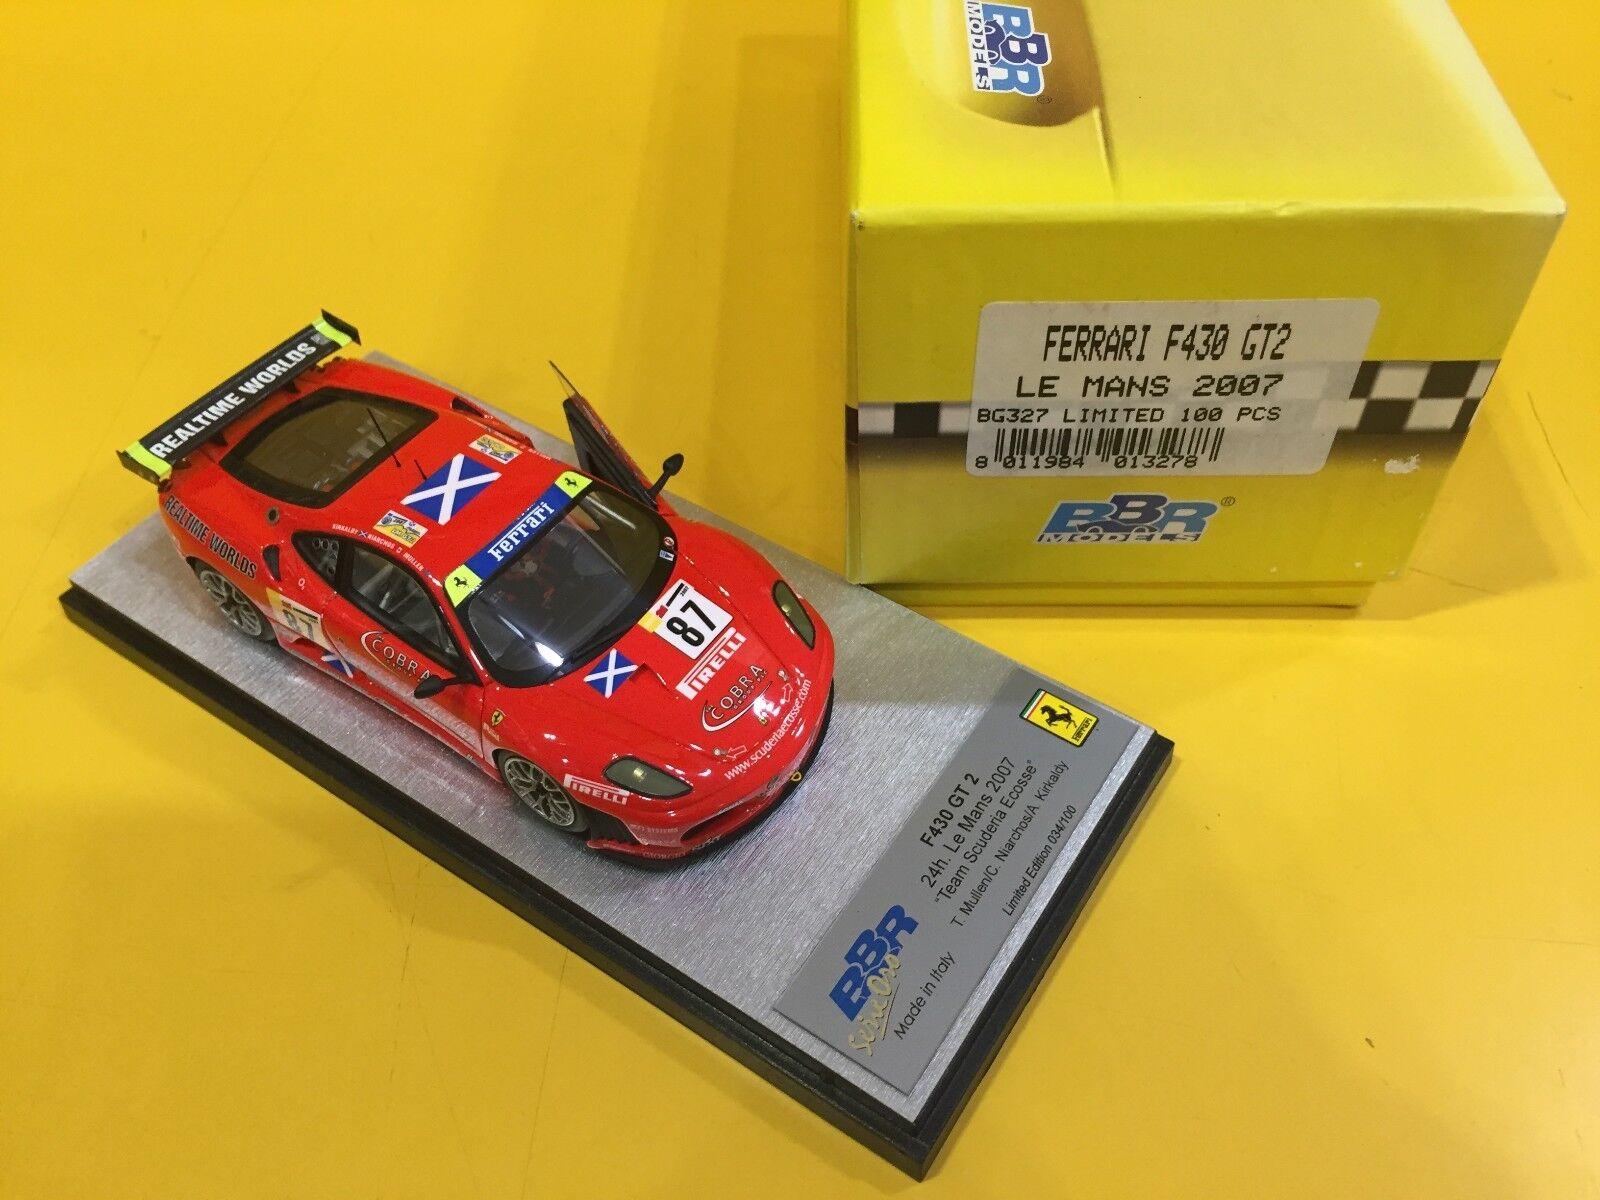 BBR MODELS BG327 - Ferrari F430 GT2 LeMans 2007  87